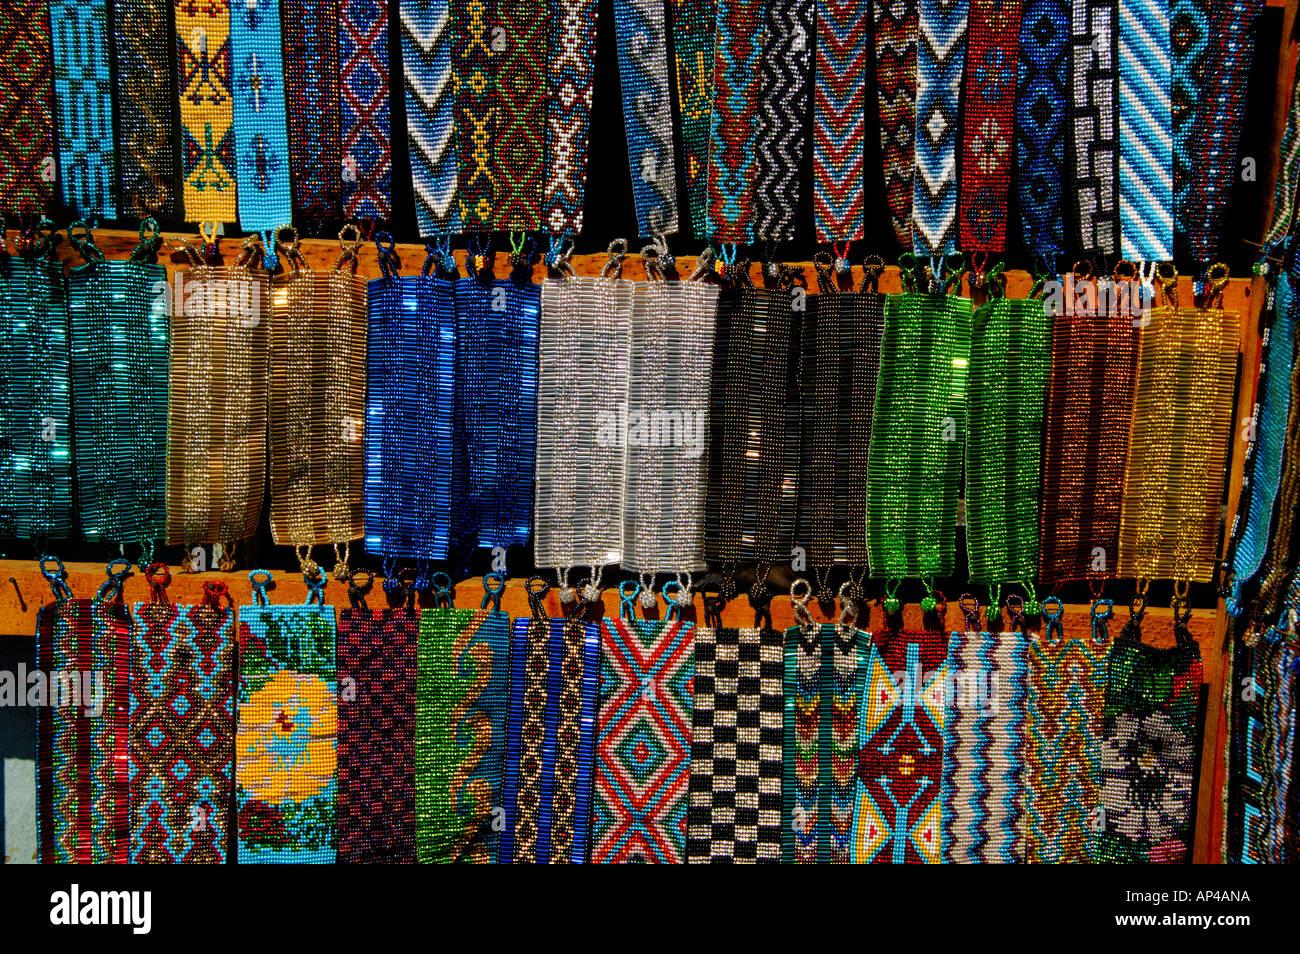 Central America, Guatemala, Western Highlands, Lake Atitlan, Santiago Atitlan. Colorful beadwork for sale. - Stock Image